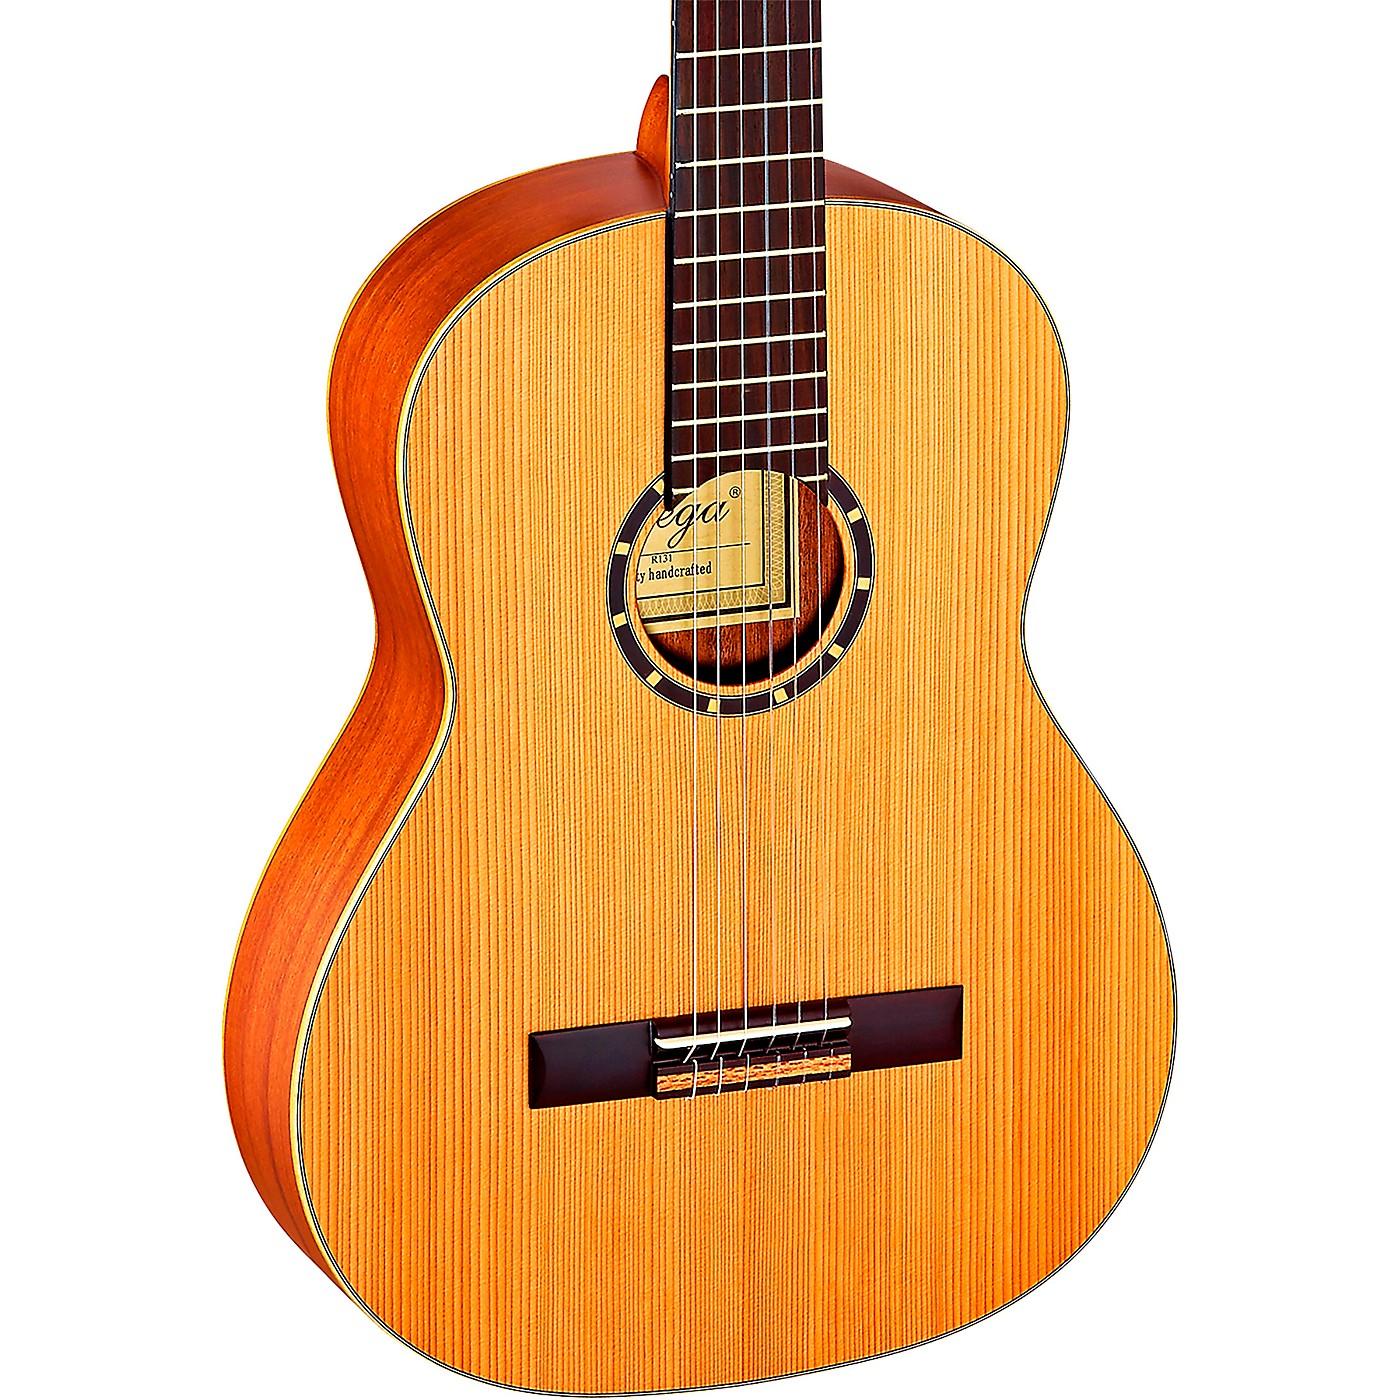 Ortega Family Series Pro R131SN Slim Neck Classical Guitar thumbnail